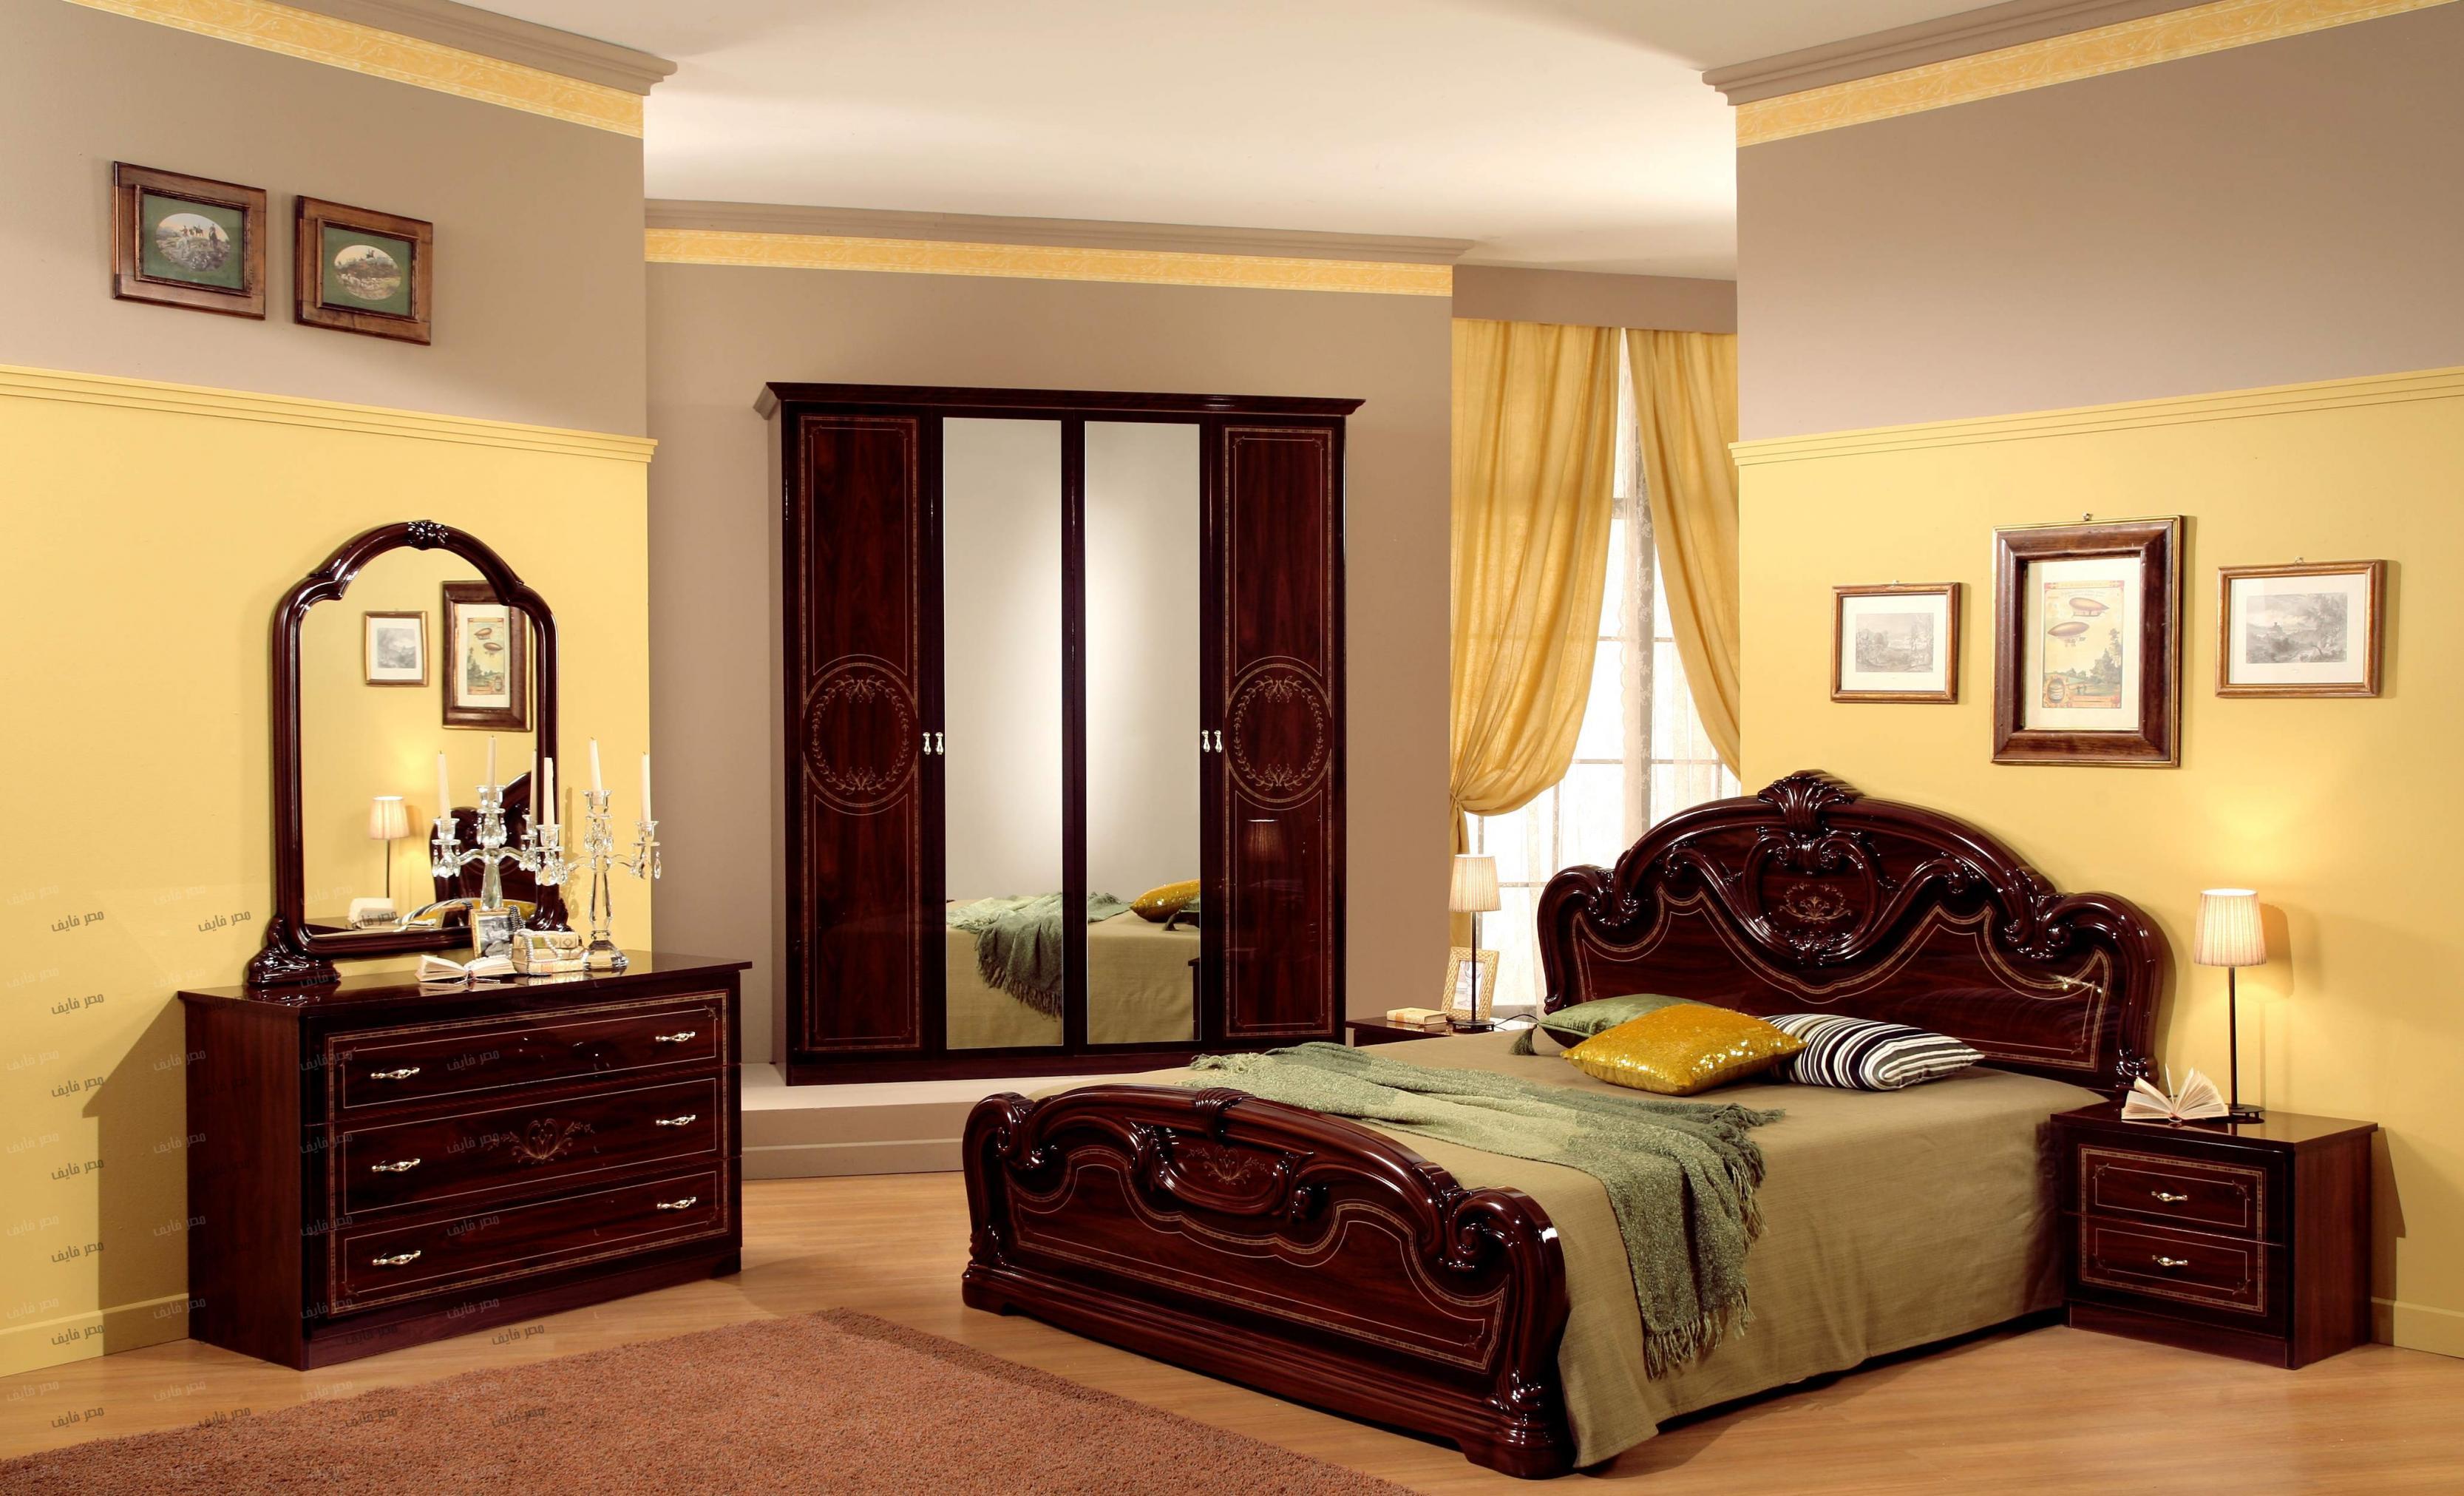 صور موديلات غرف نوم , تصميمات حديثه لموديلات لغرف نوم